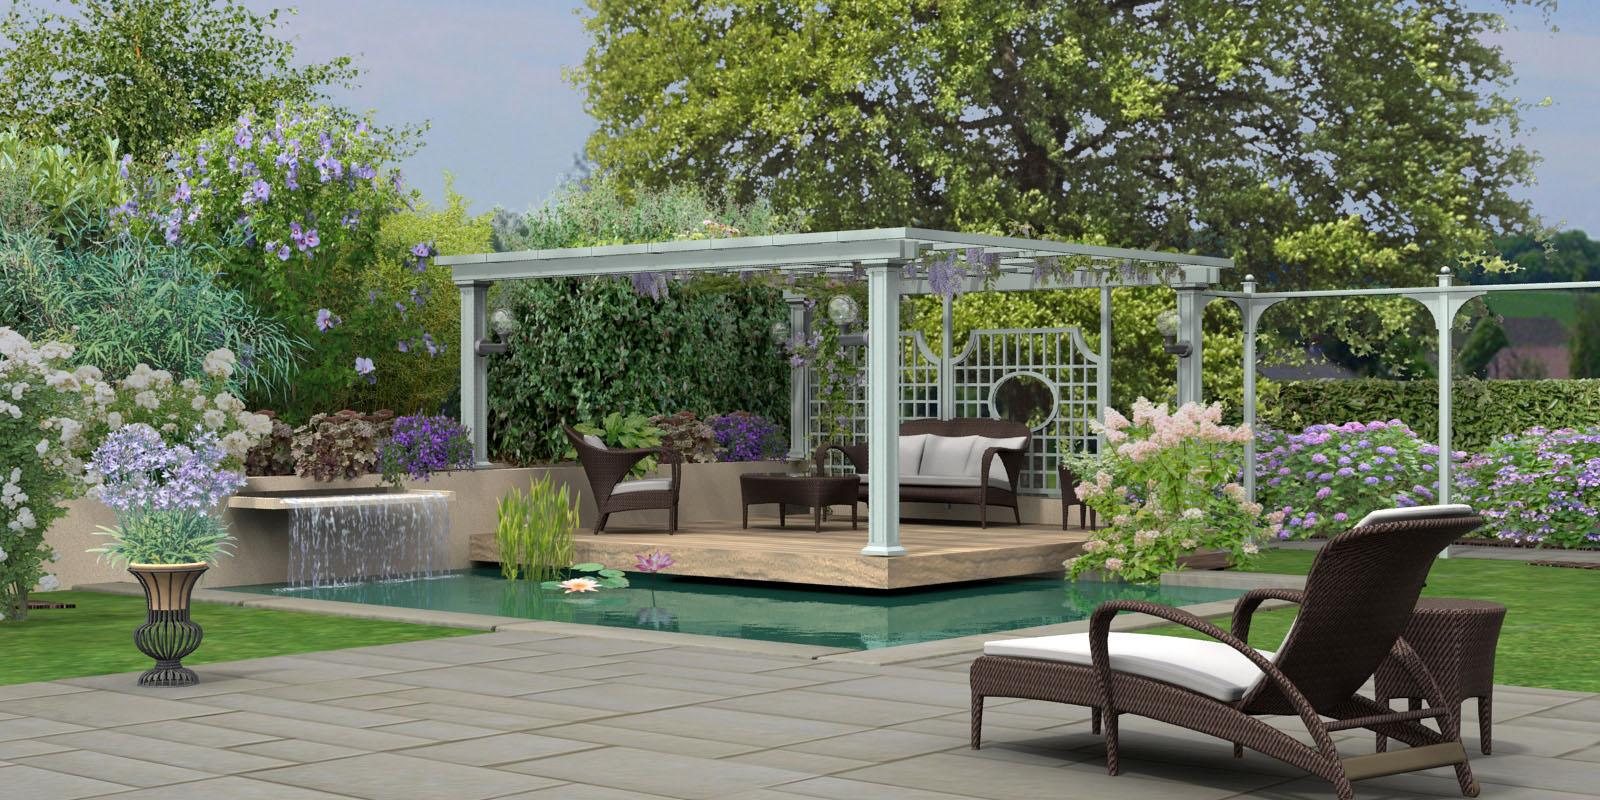 Amenagement jardin 3d en ligne - Amenager son jardin en ligne ...